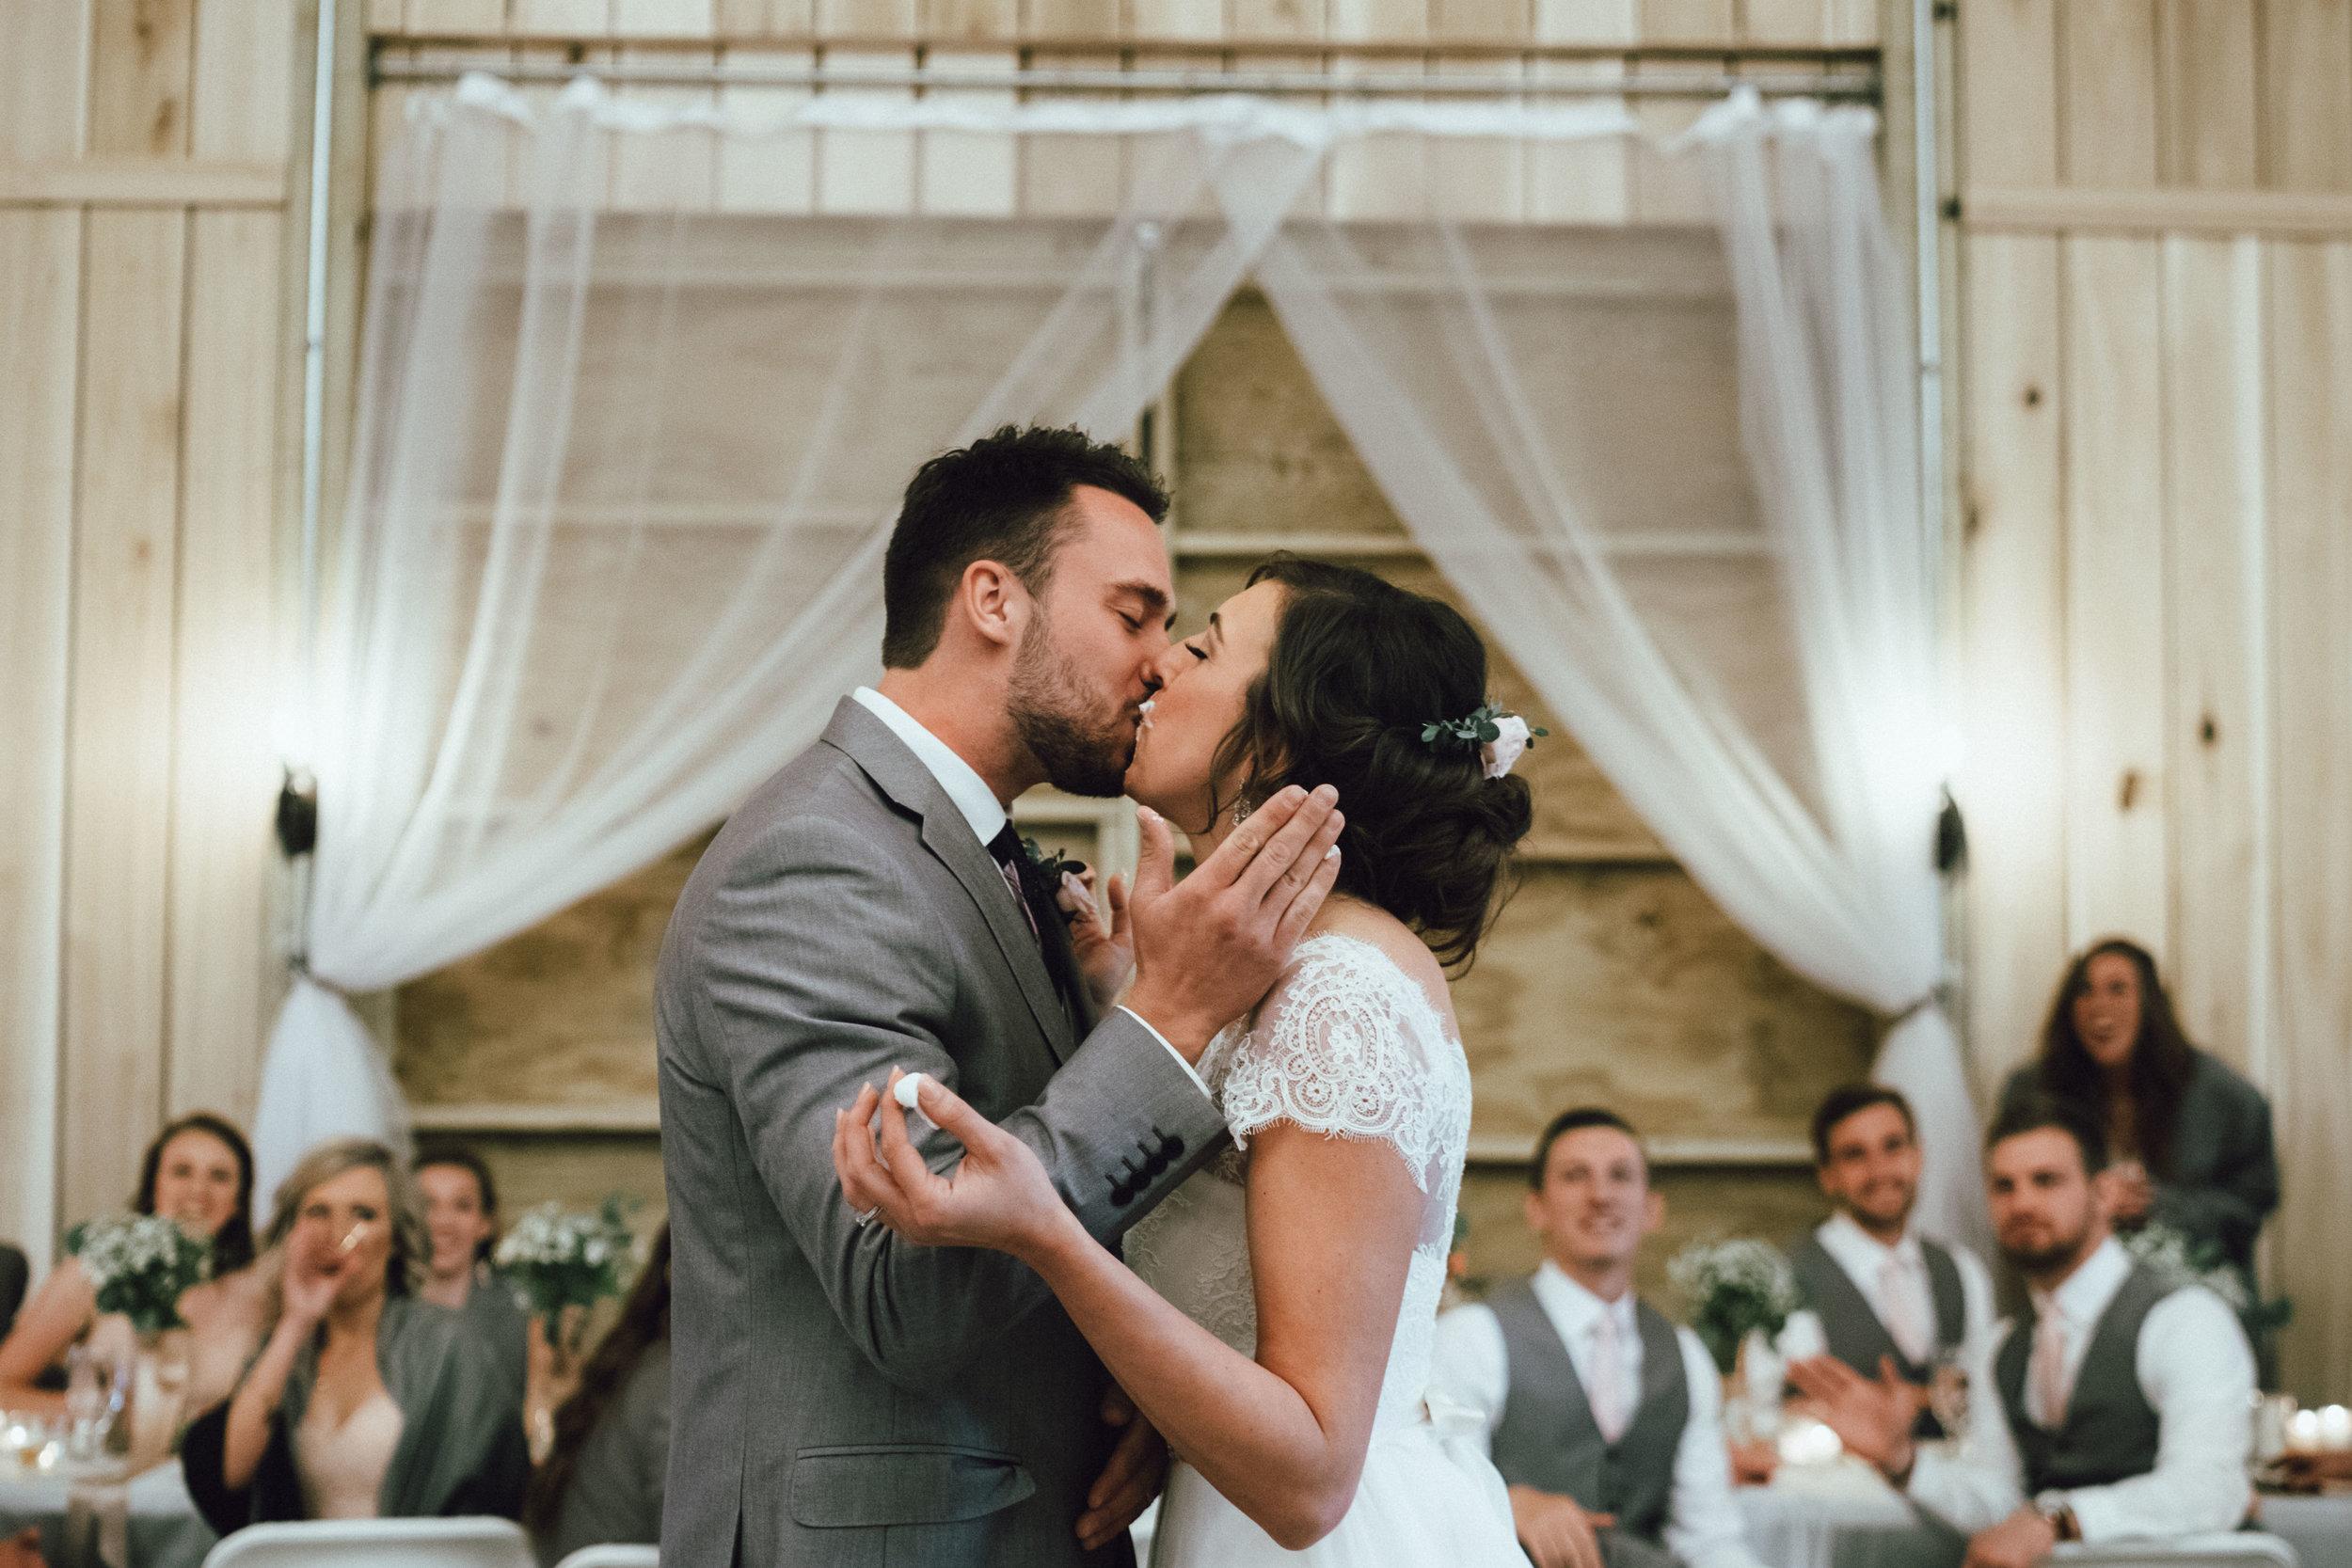 Steph-Ben-Blog-Indianapolis-Wedding-63.jpg